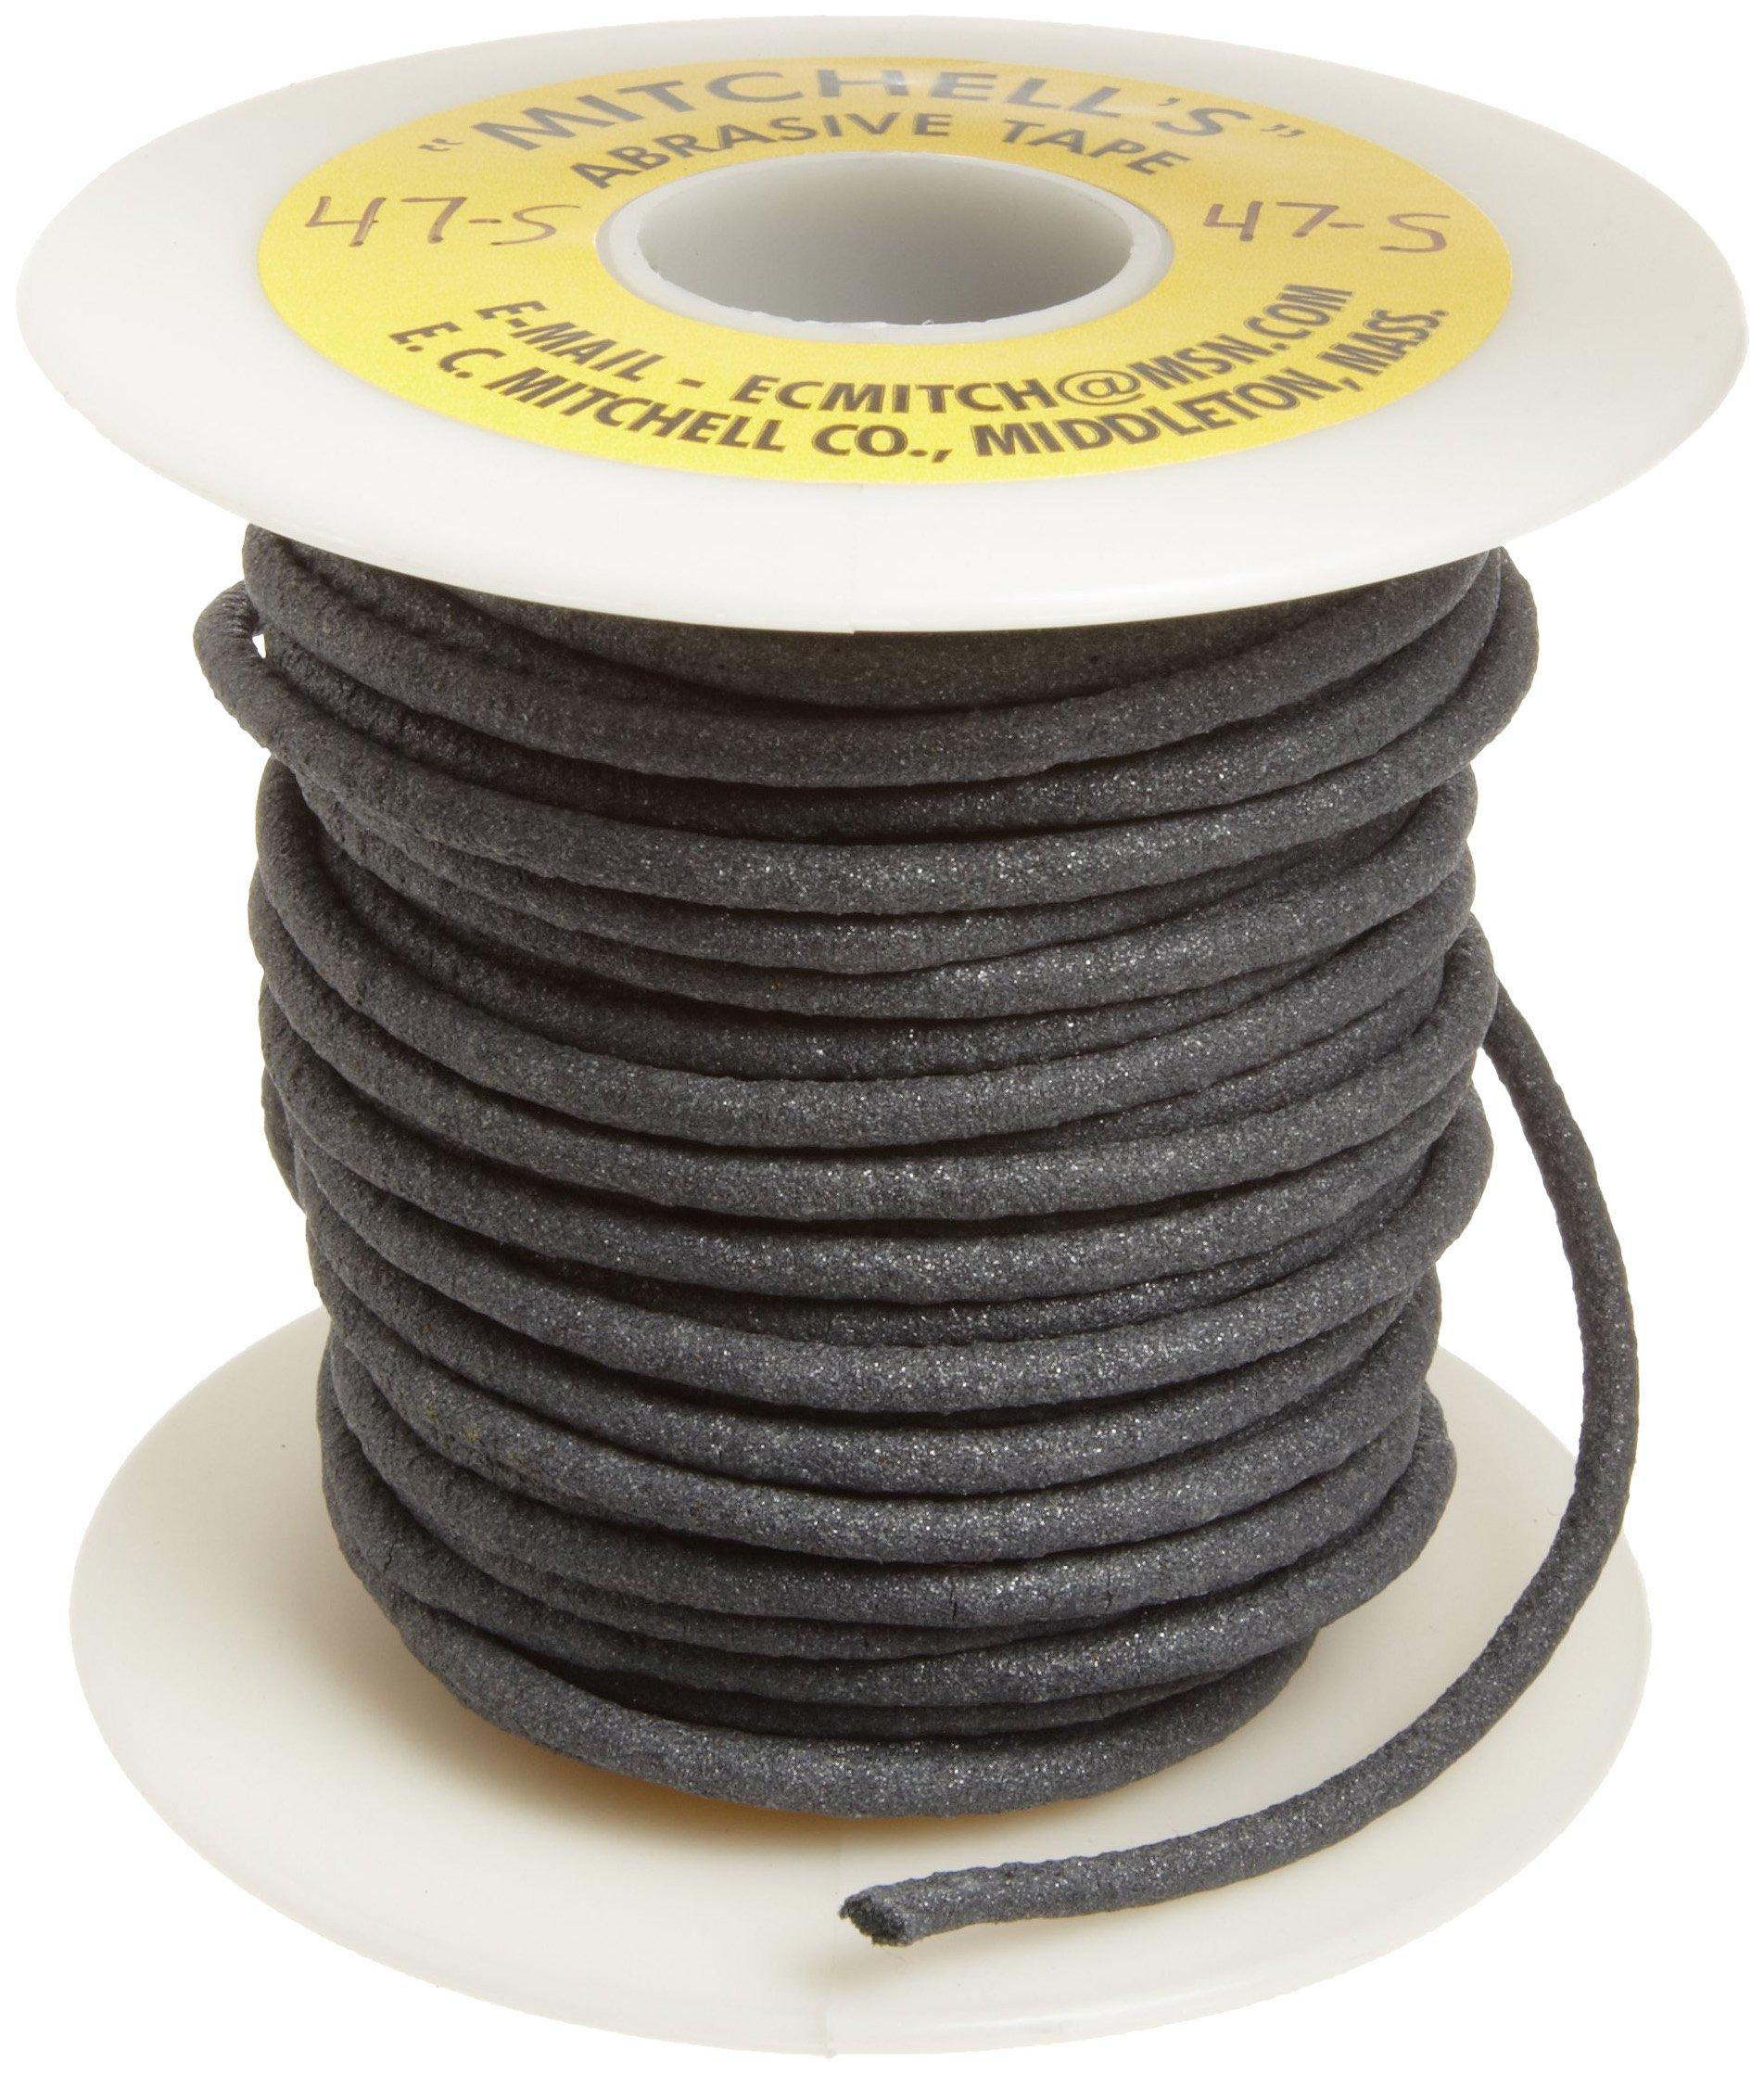 Mitchell Abrasives 47-S Round Abrasive Cord, Silicon Carbide 120 Grit .125'' Diameter x 25 Feet by Mitchell Abrasives